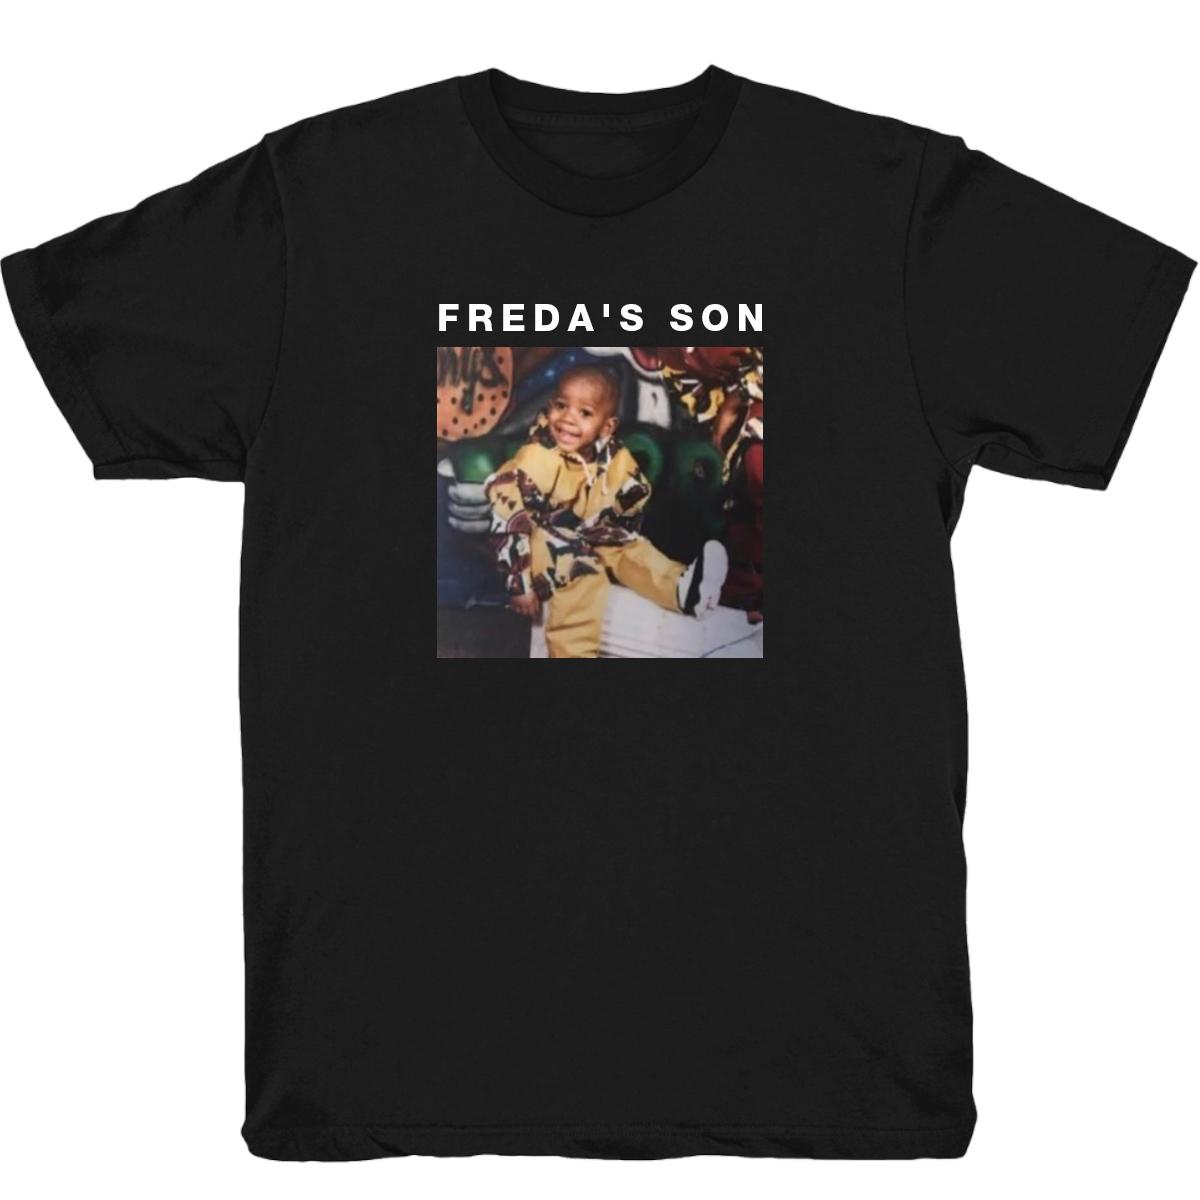 Freda's Son Baby Photo T-Shirt